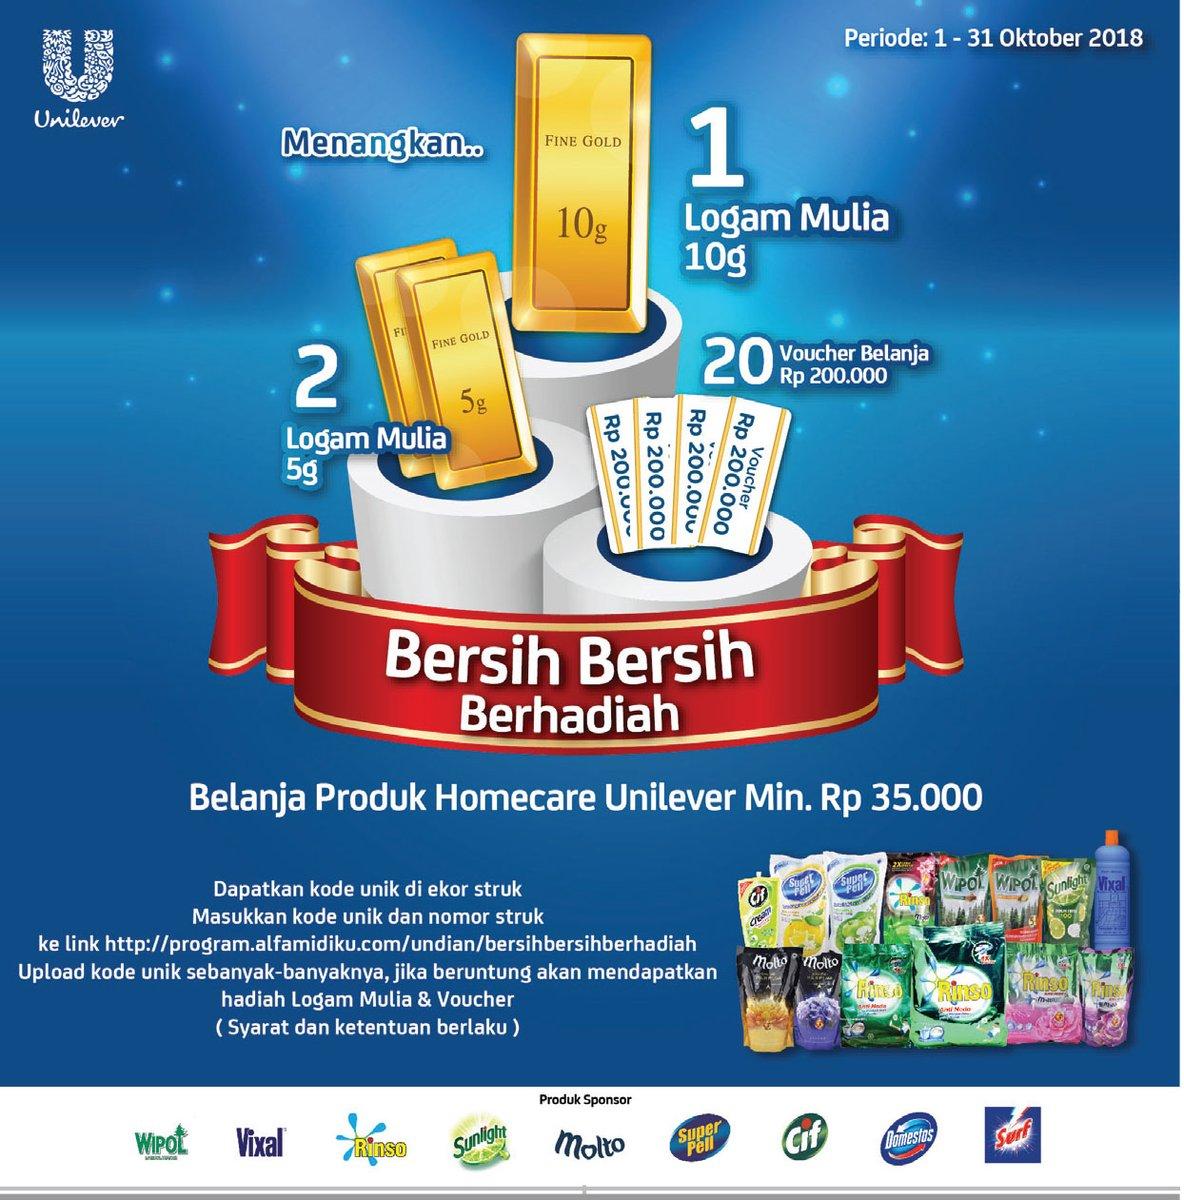 Alfamidi - Promo Undian Unilever Min 35 Ribu Dapat Hadiah 10 gr Emas (s.d 31 Okt 2018)